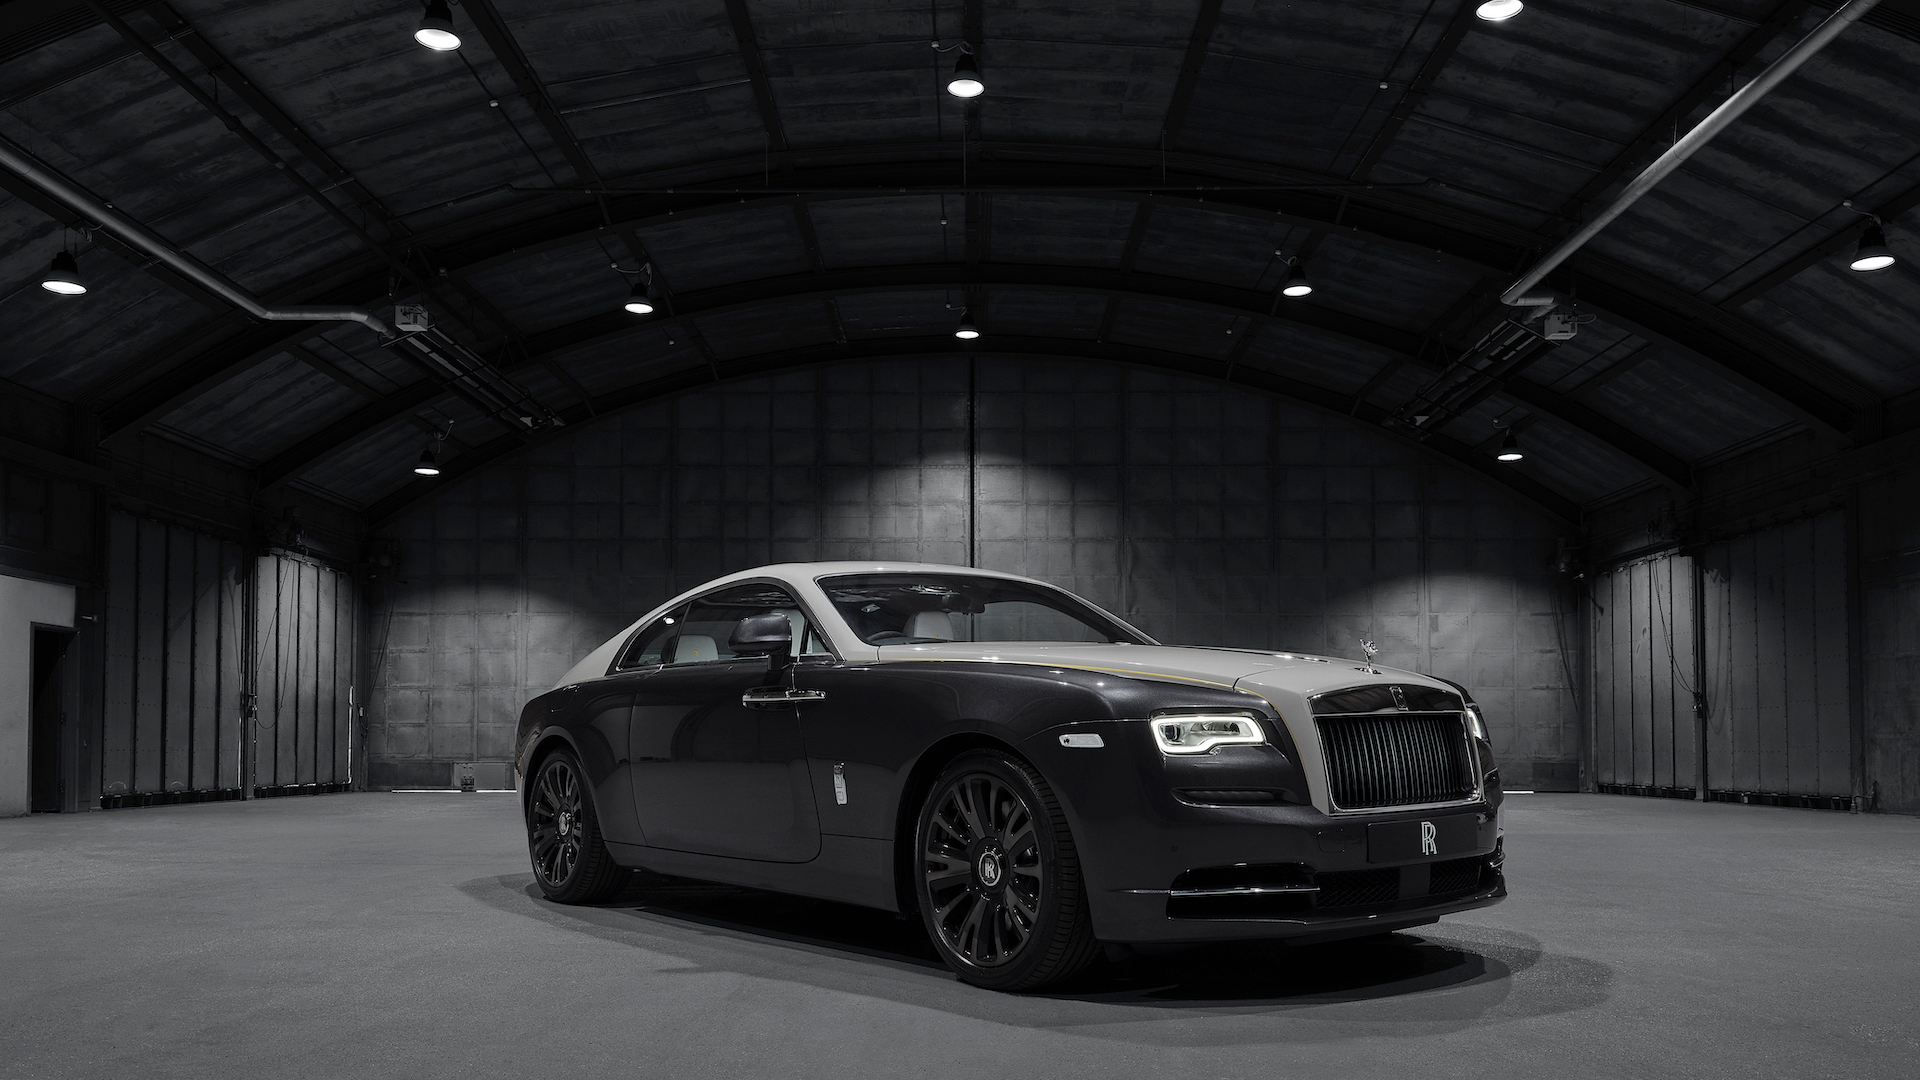 Rolls Royce Wraith Eagle Viii Recalls A 20th Century Milestone